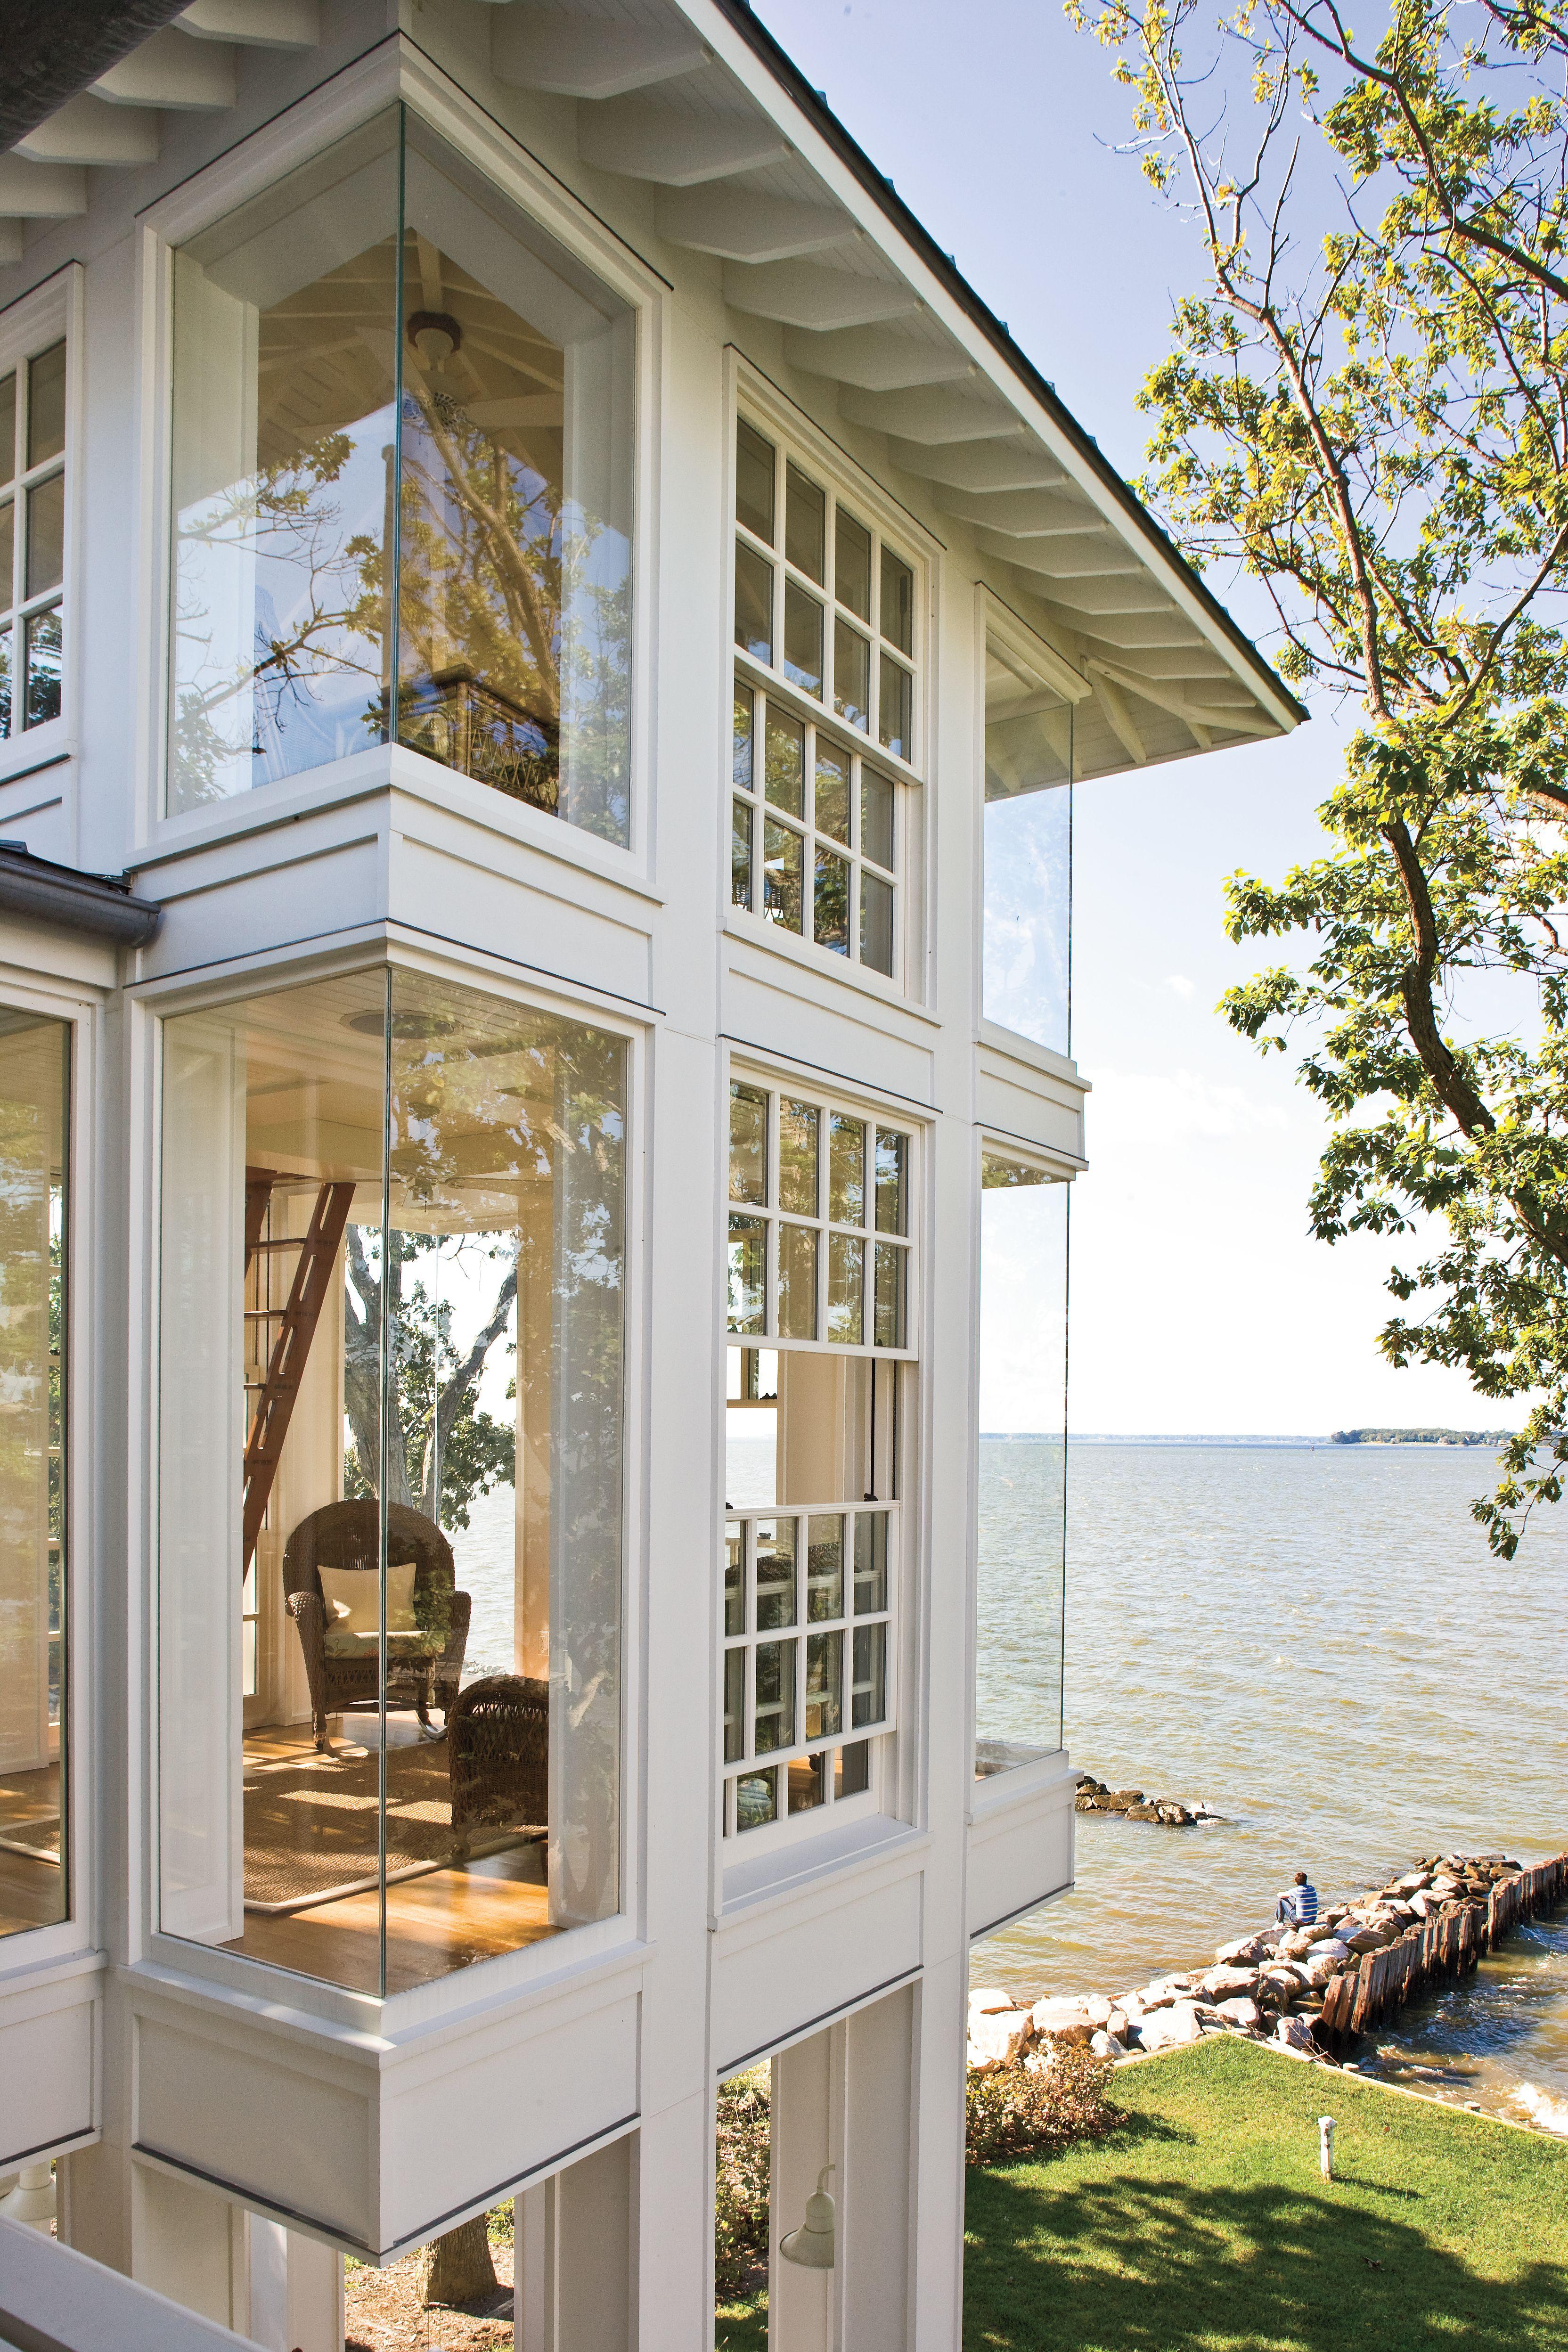 Chesapeake Bay   My waterfront home ideas   Pinterest   Chesapeake ...